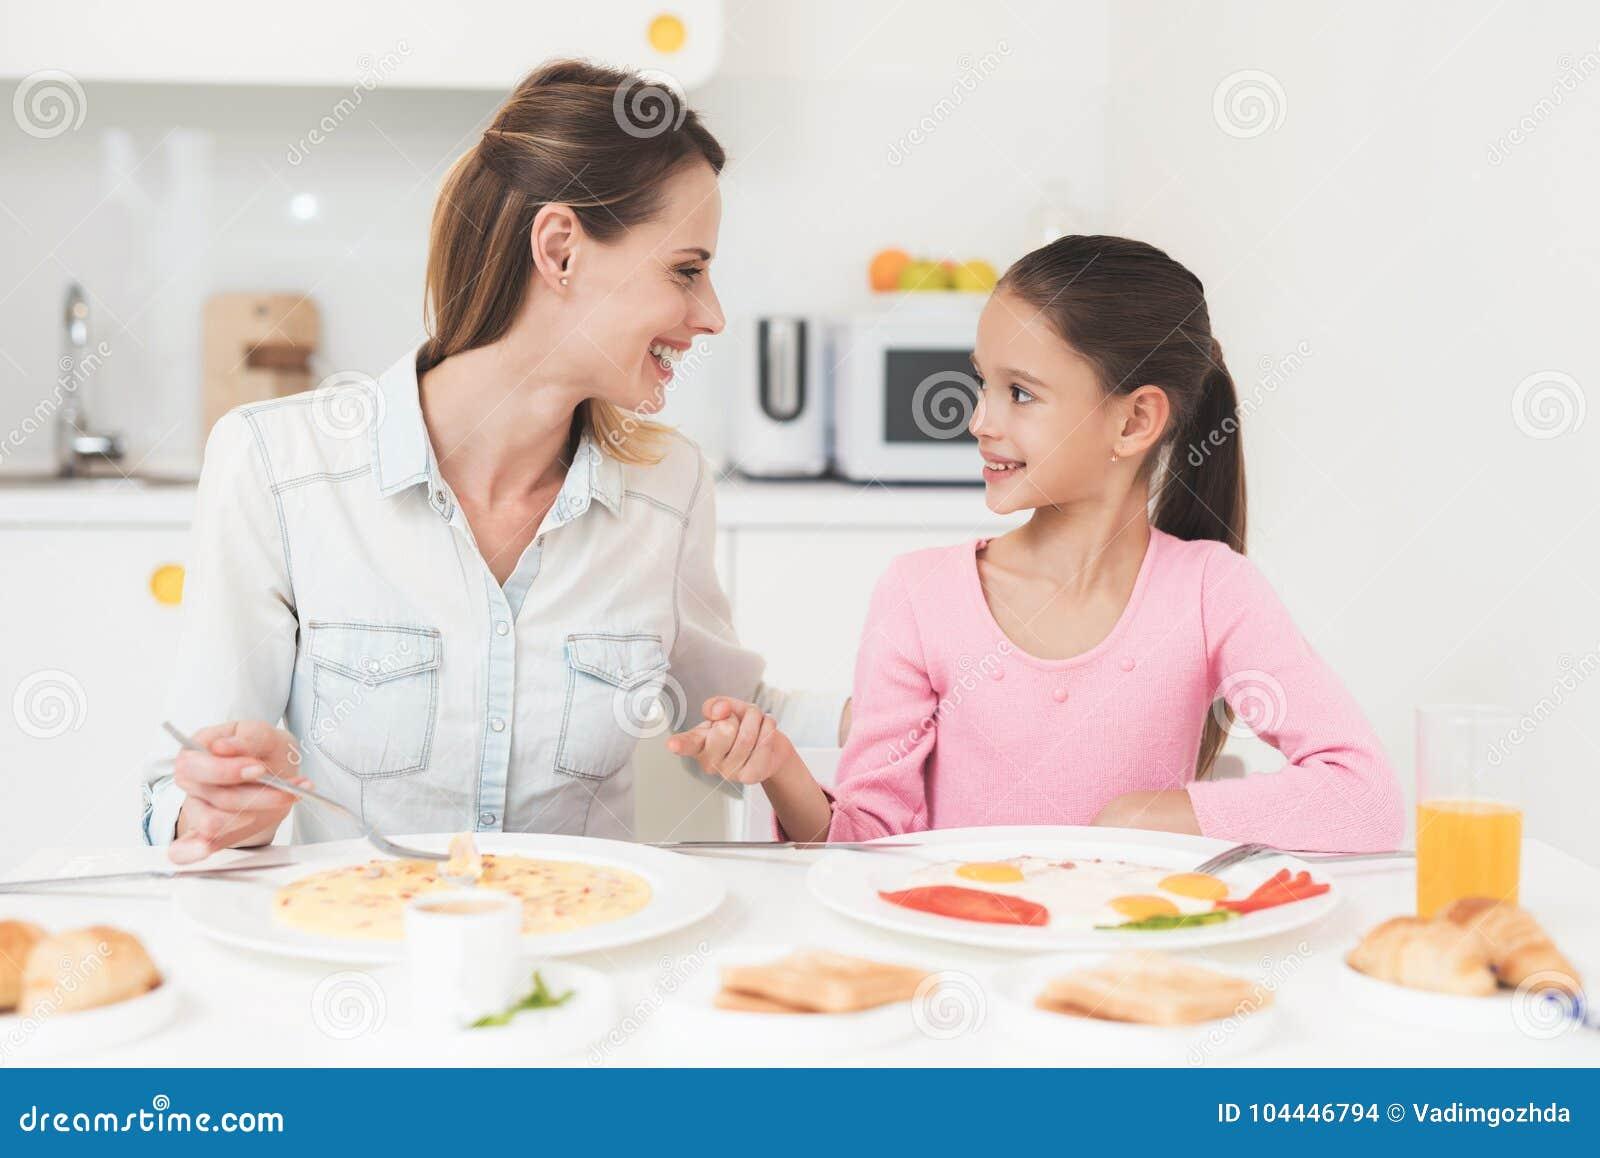 завтрак для дочери фото